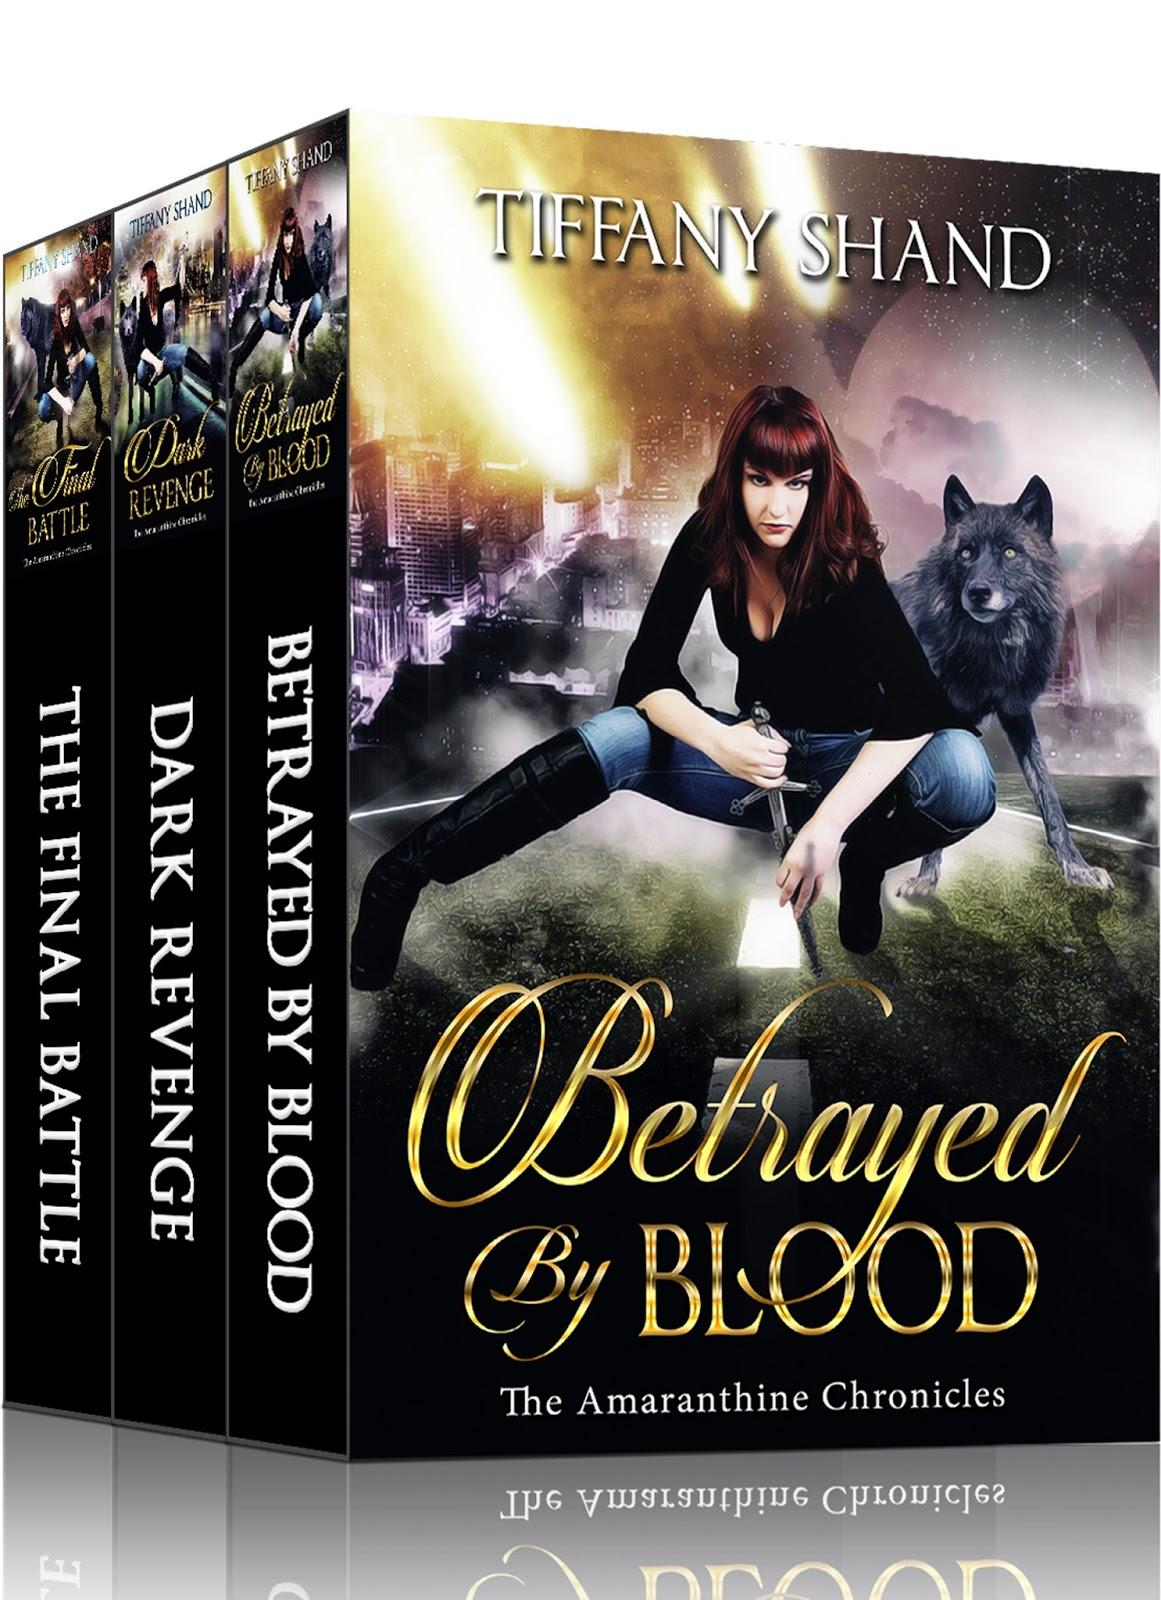 Guest Post: Tiffany Shand – Emily Murdoch: Author